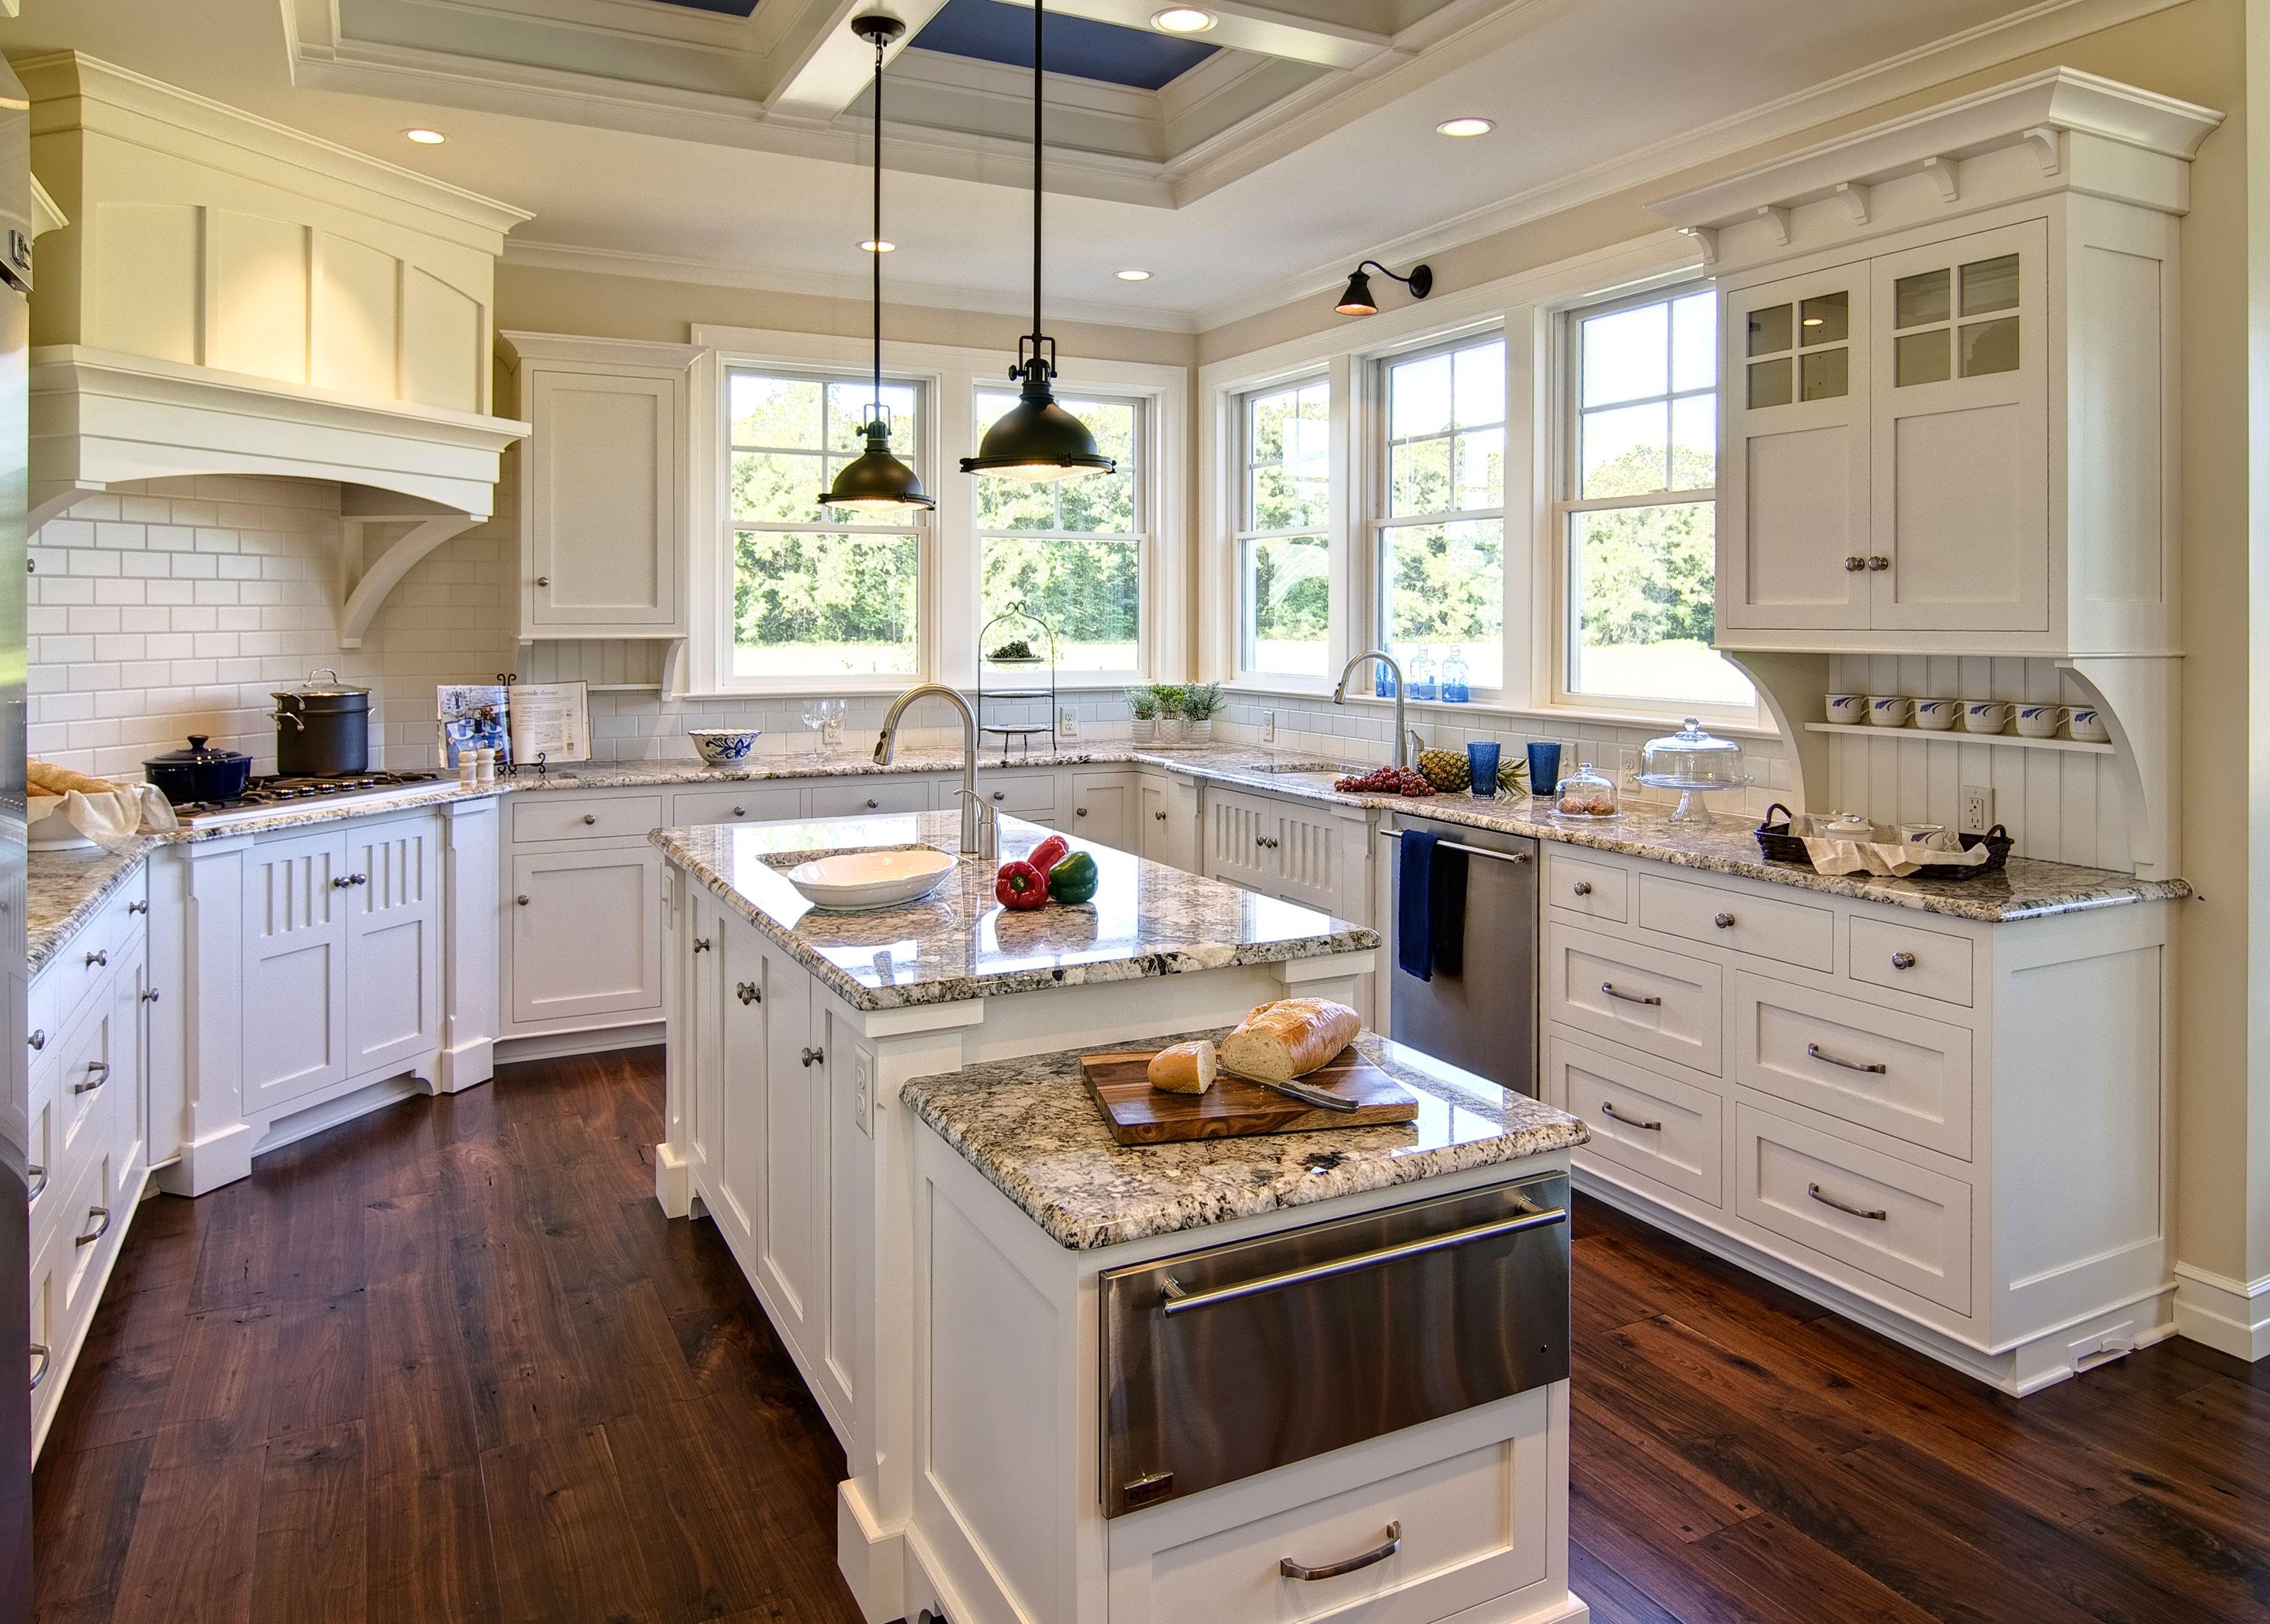 Beach house style kitchen cabinets kitchen cabinets pinterest